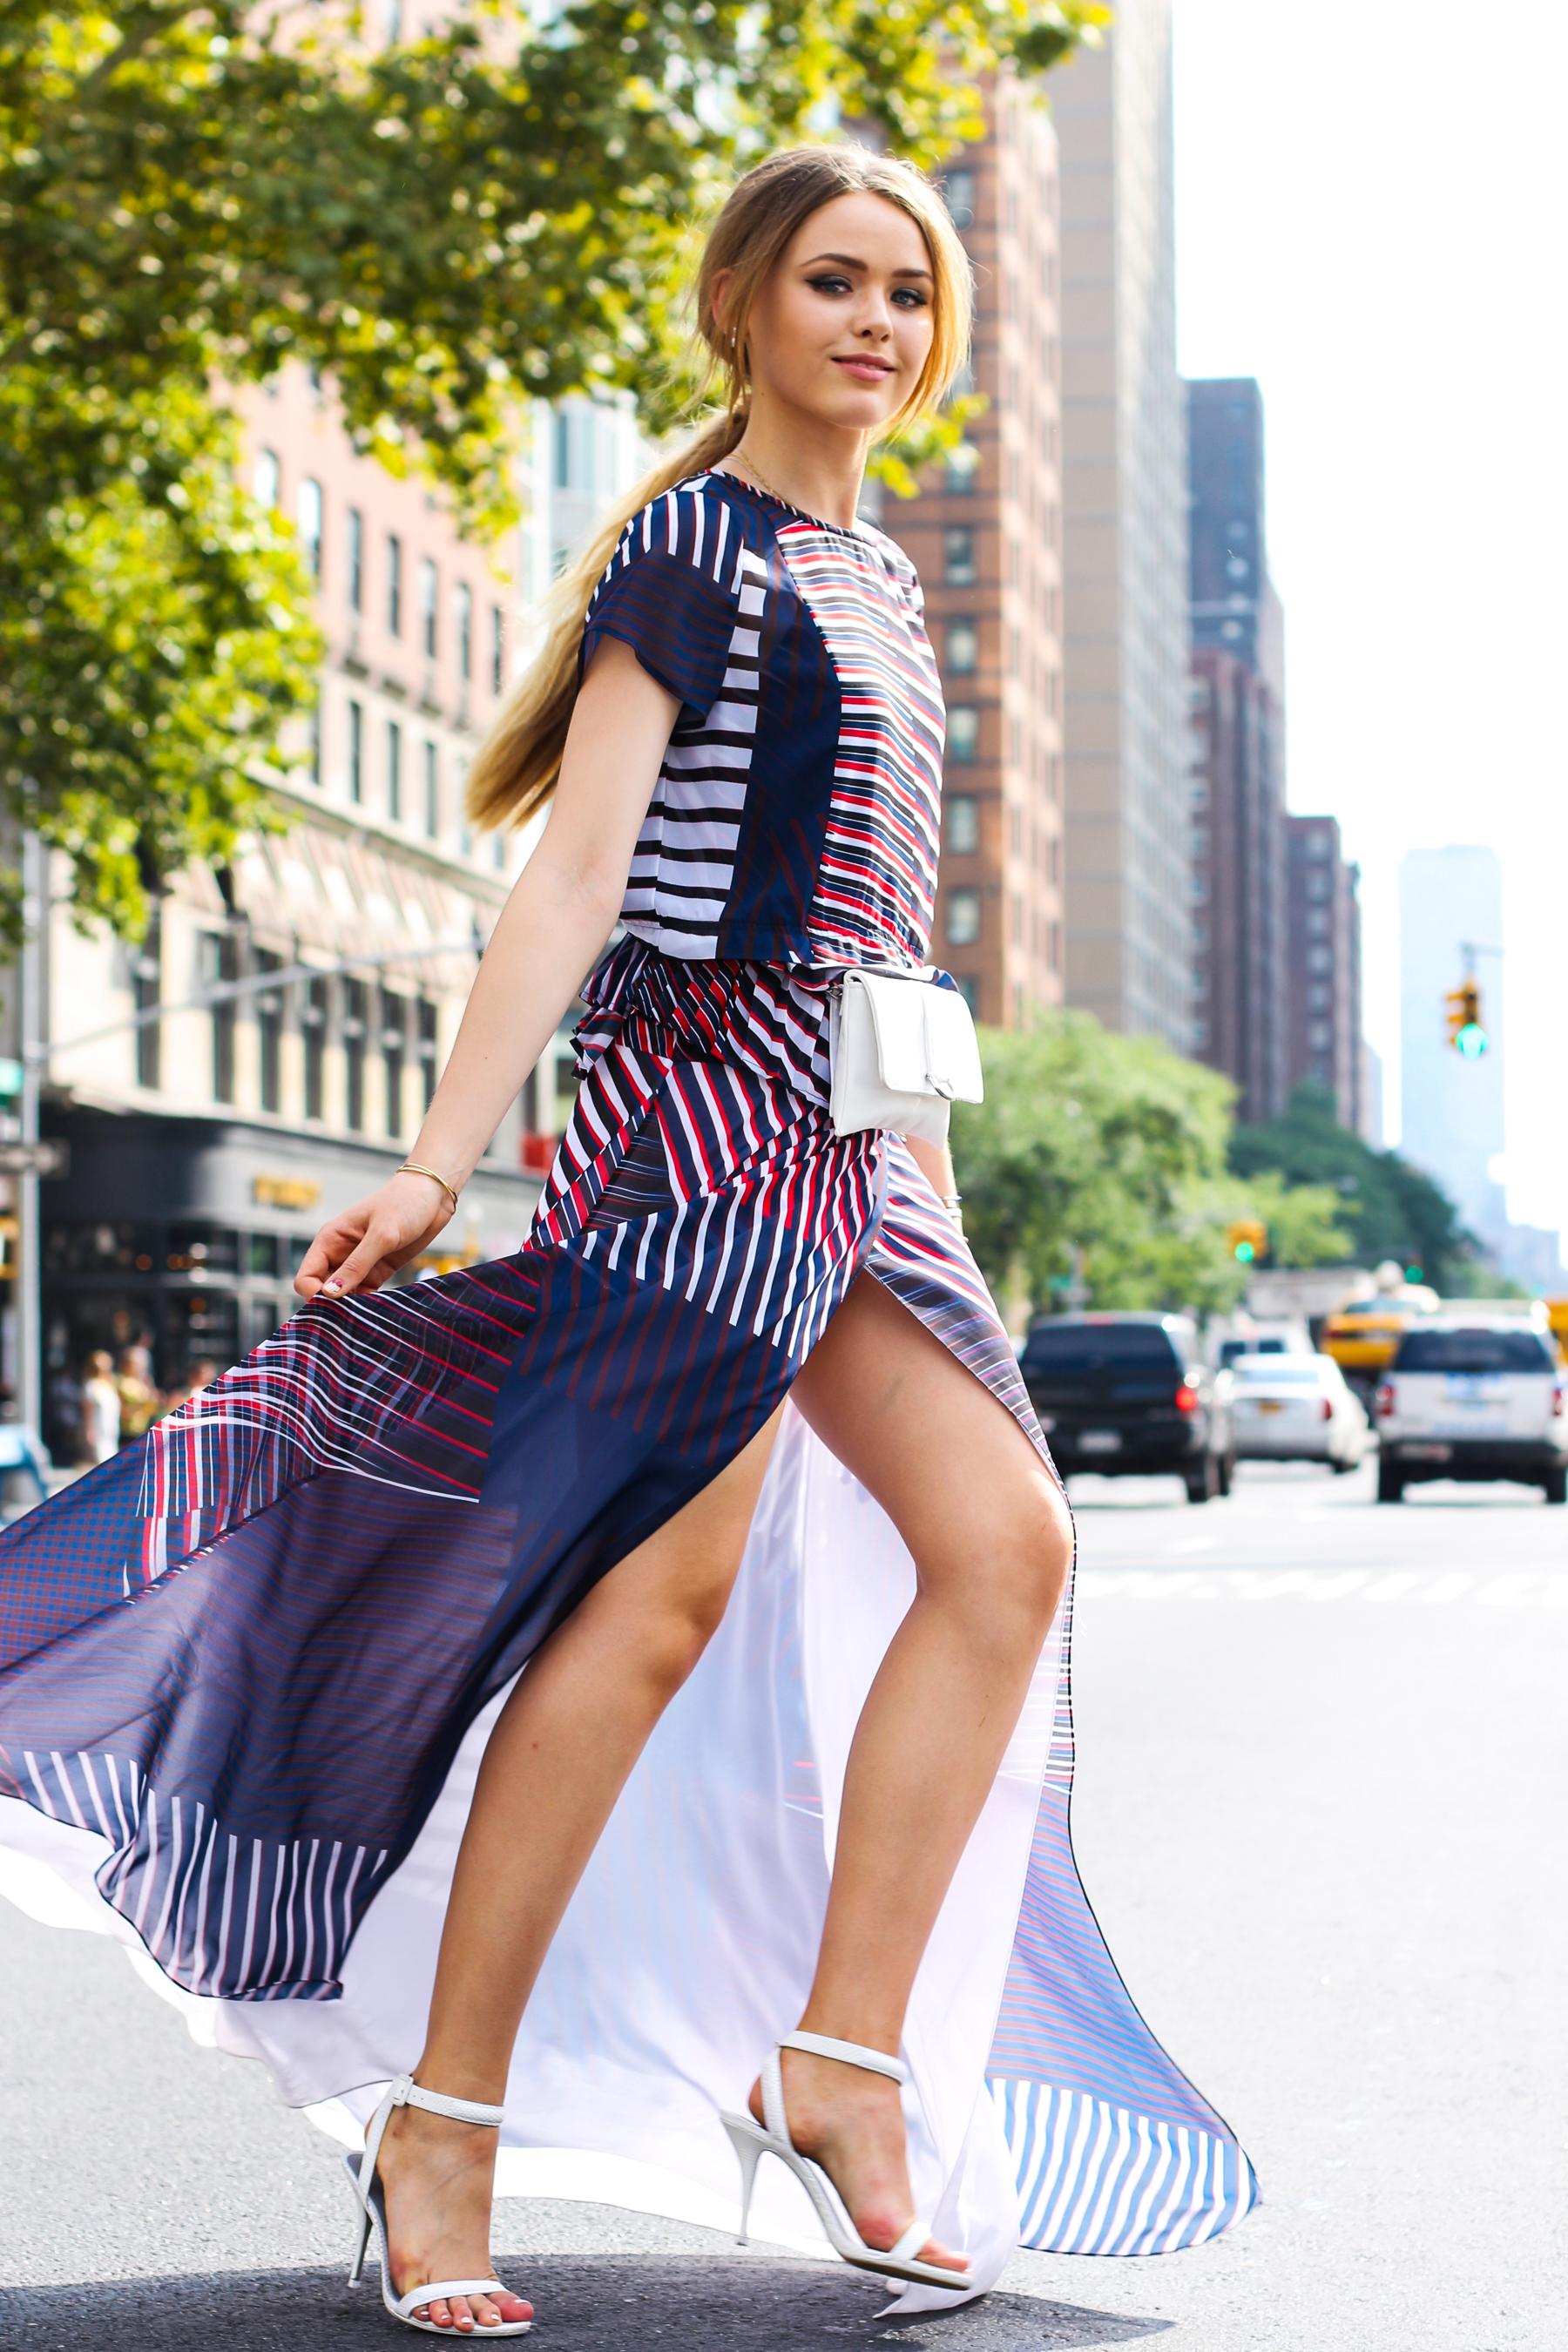 kristina-bazan-kayture-fashion-blogger-streetstyle-photography-by-ryan-chua-new-york-fashion-week-ss2015.jpg